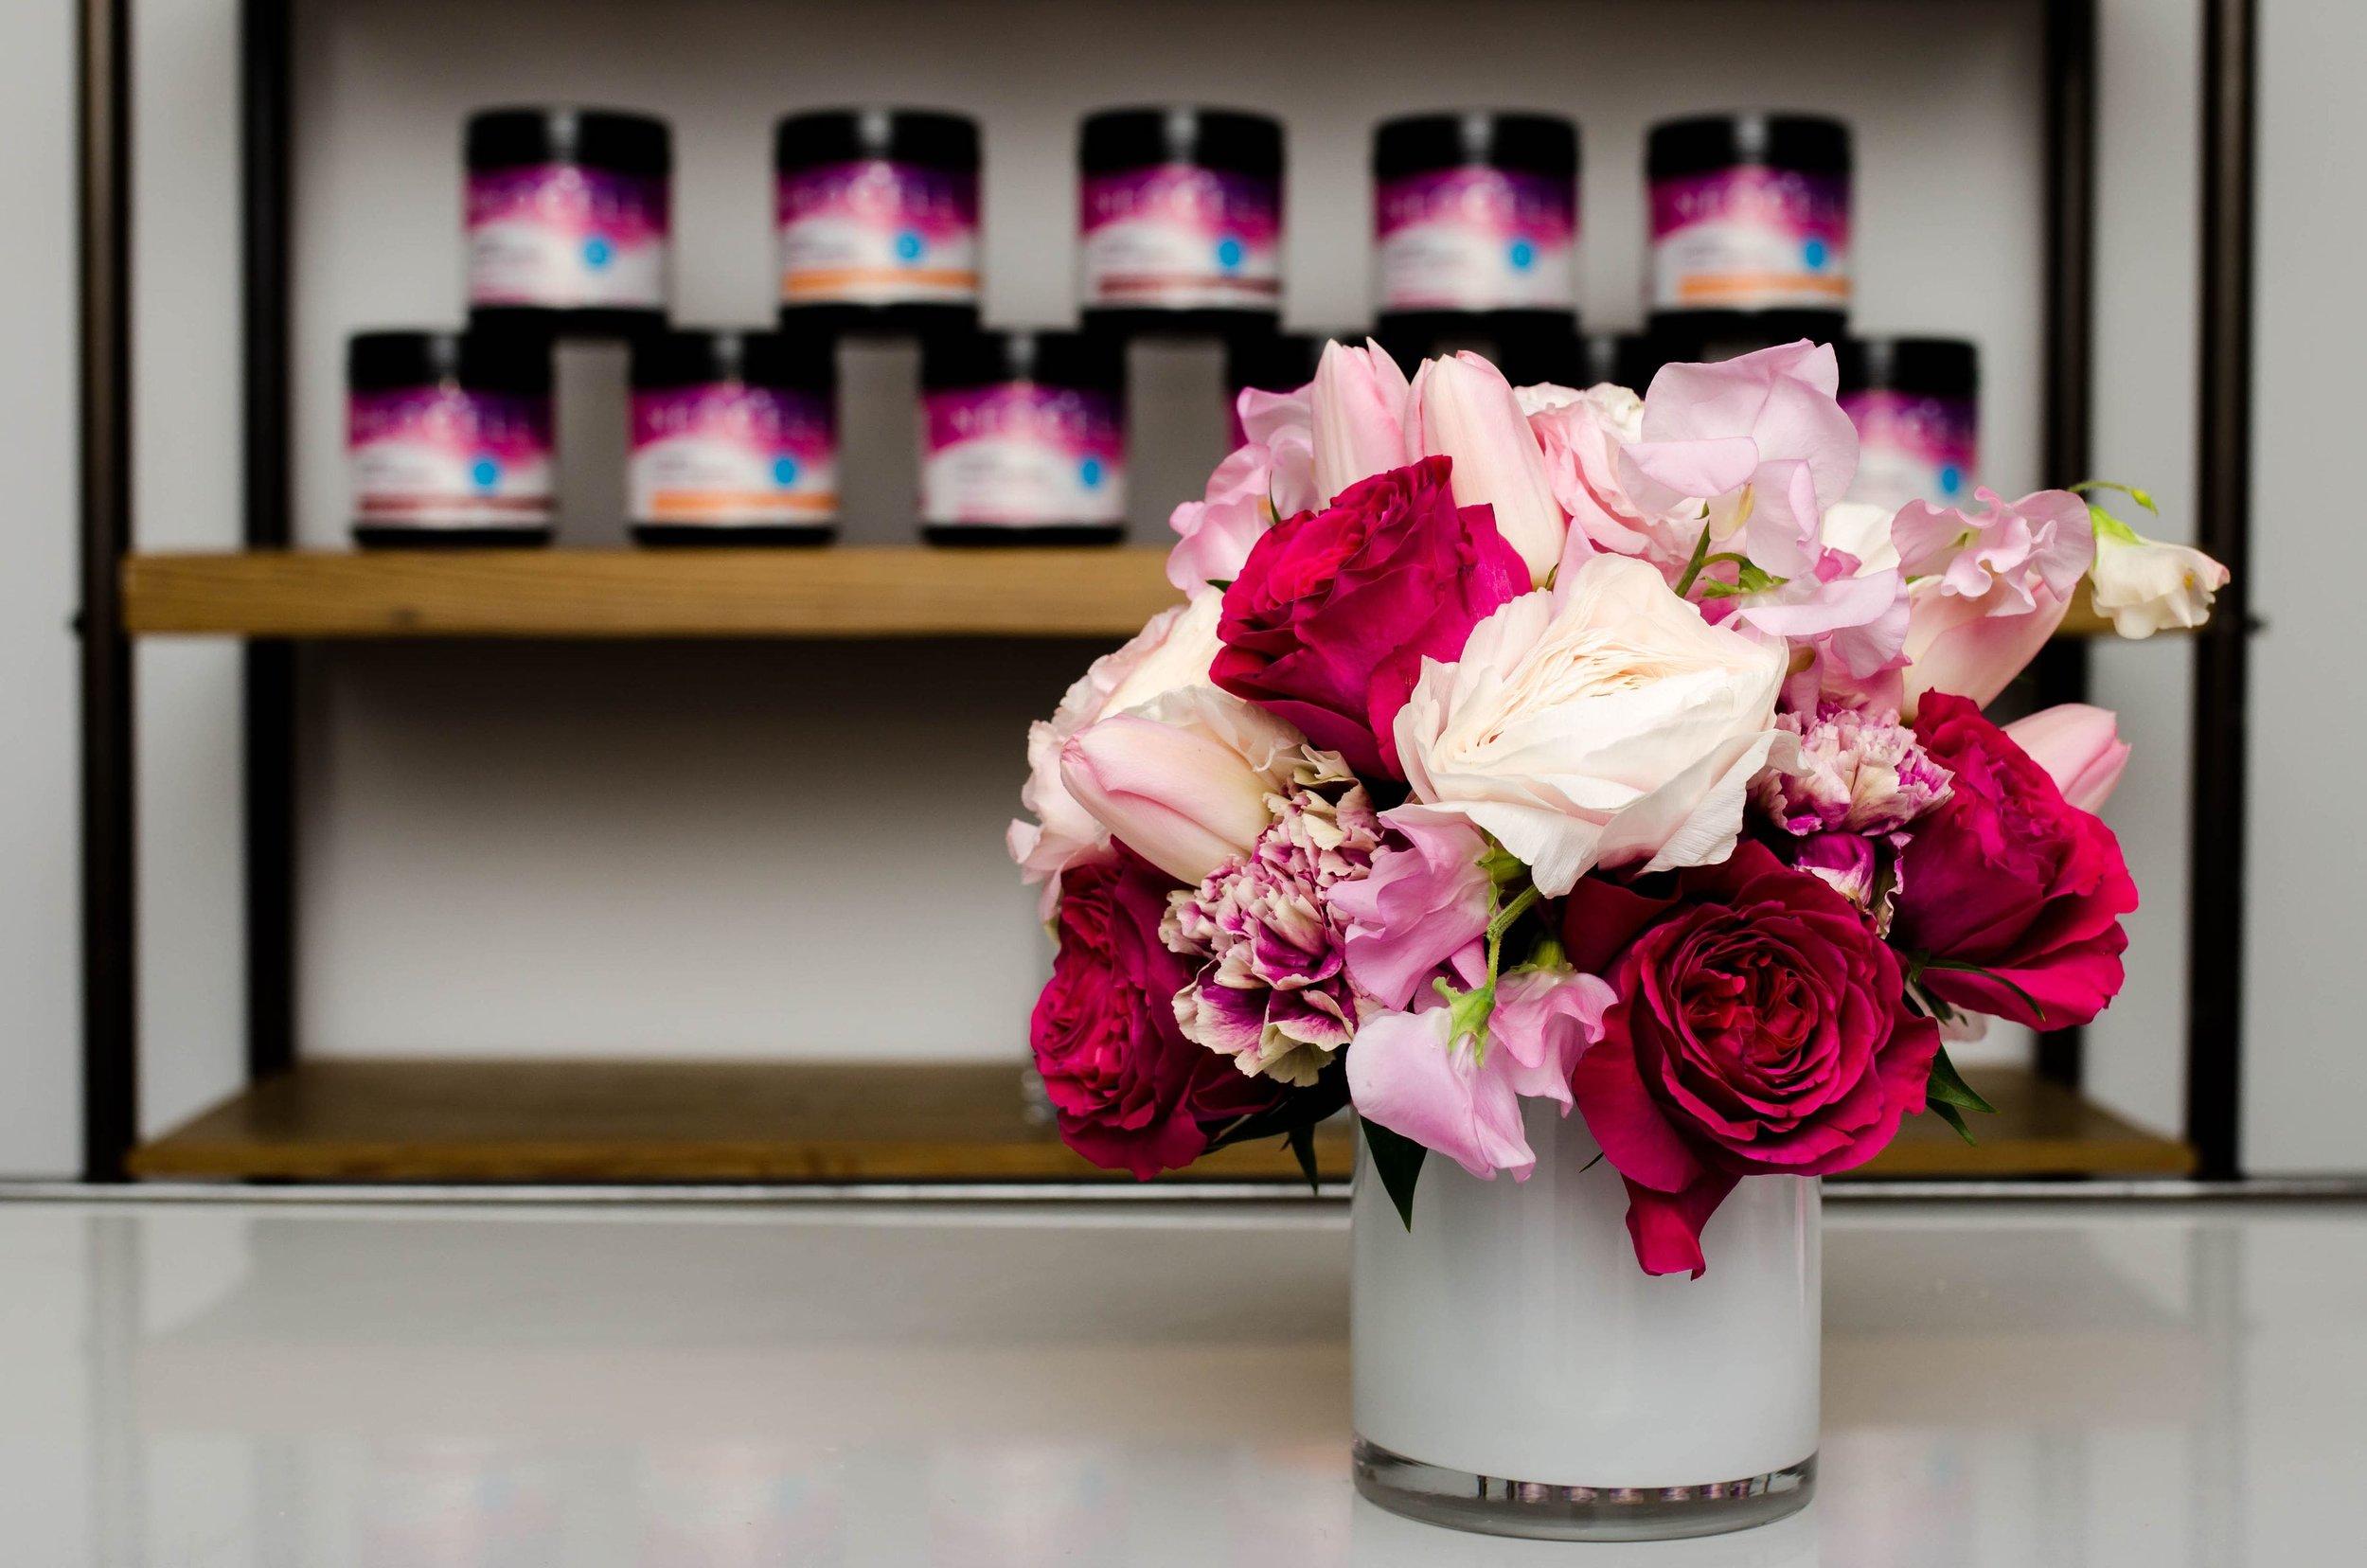 NeoCell Branded Arrangement - B Floral